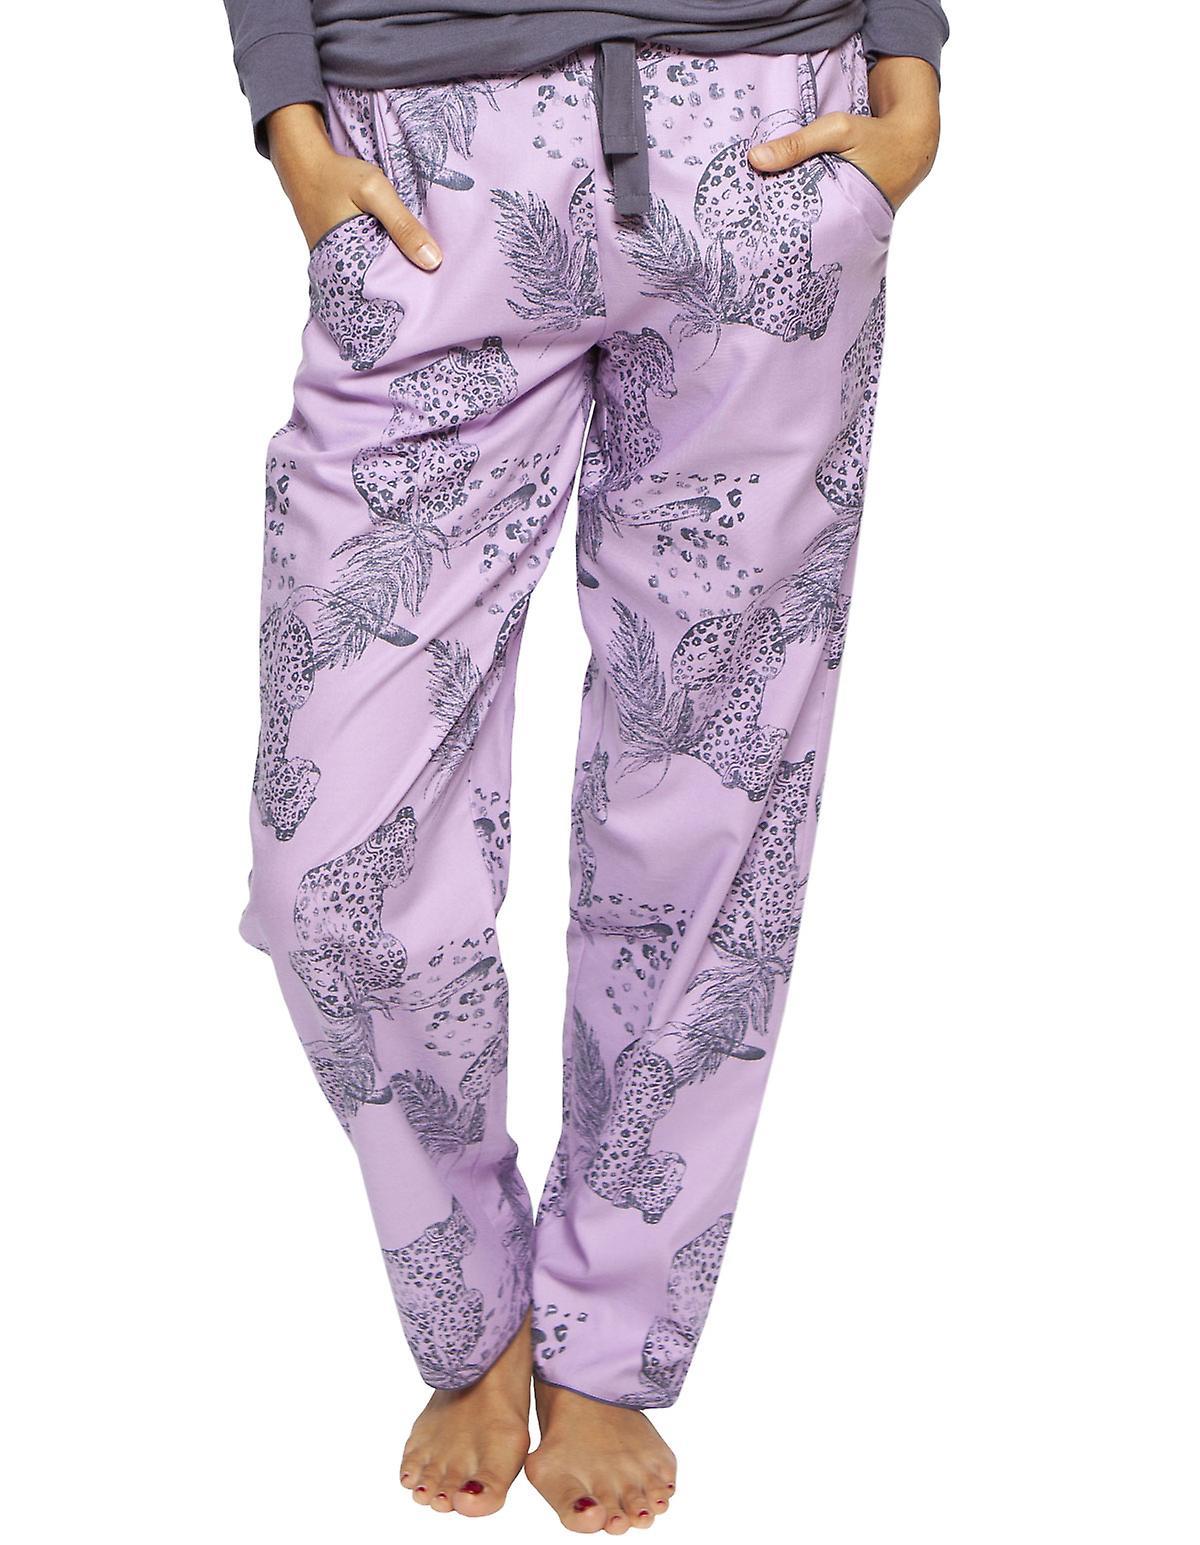 Cyberjammies 4182 Women's Laura Pink Mix Leopard Print Cotton Pyjama Pant